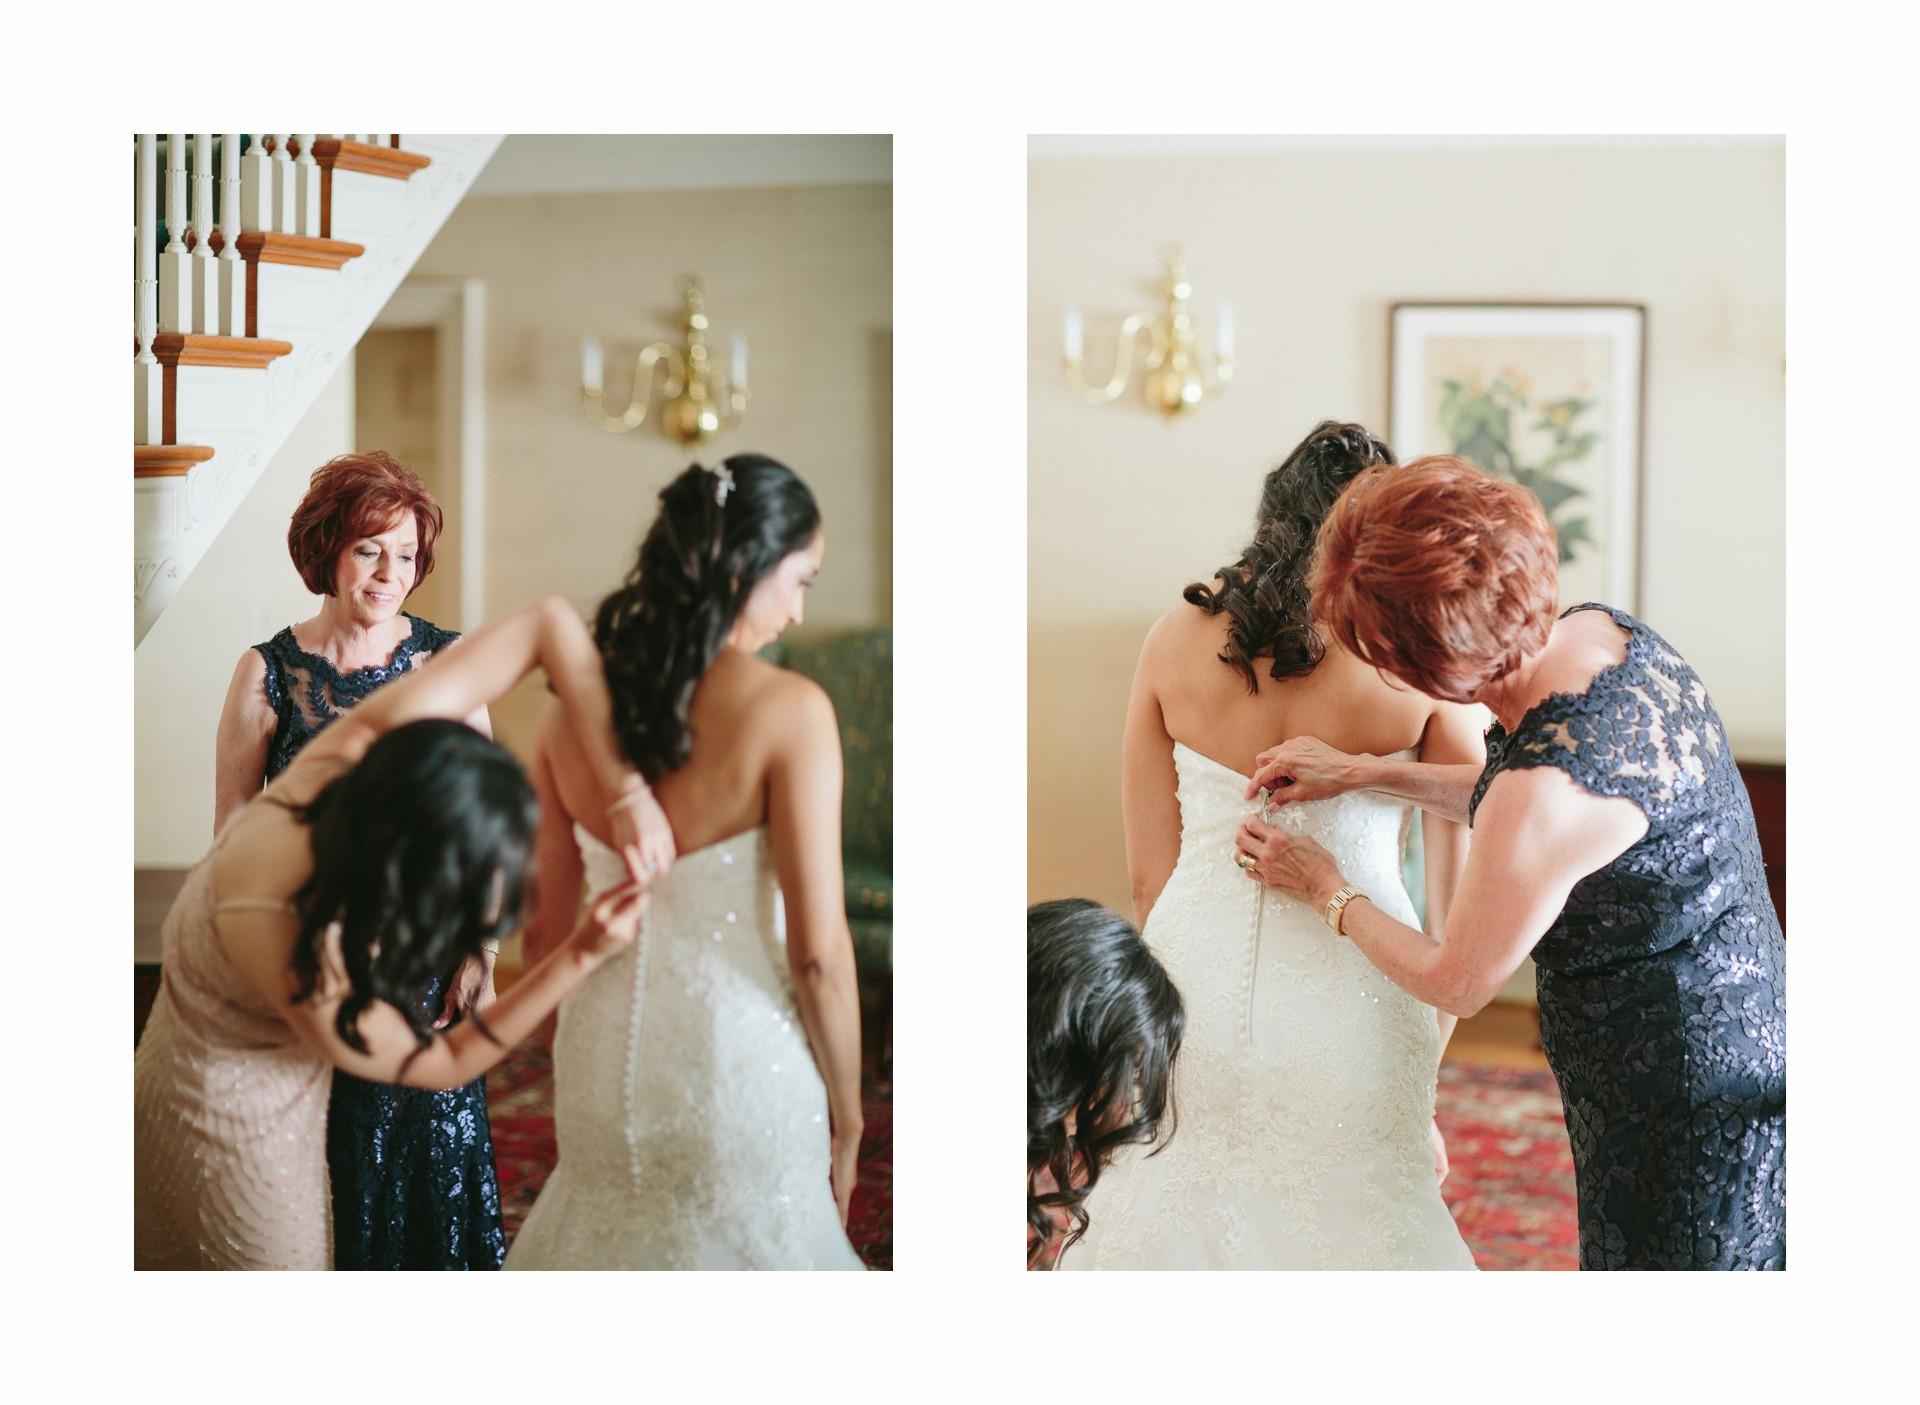 Bolton House Wedding Photographer in Beachwood 10.jpg